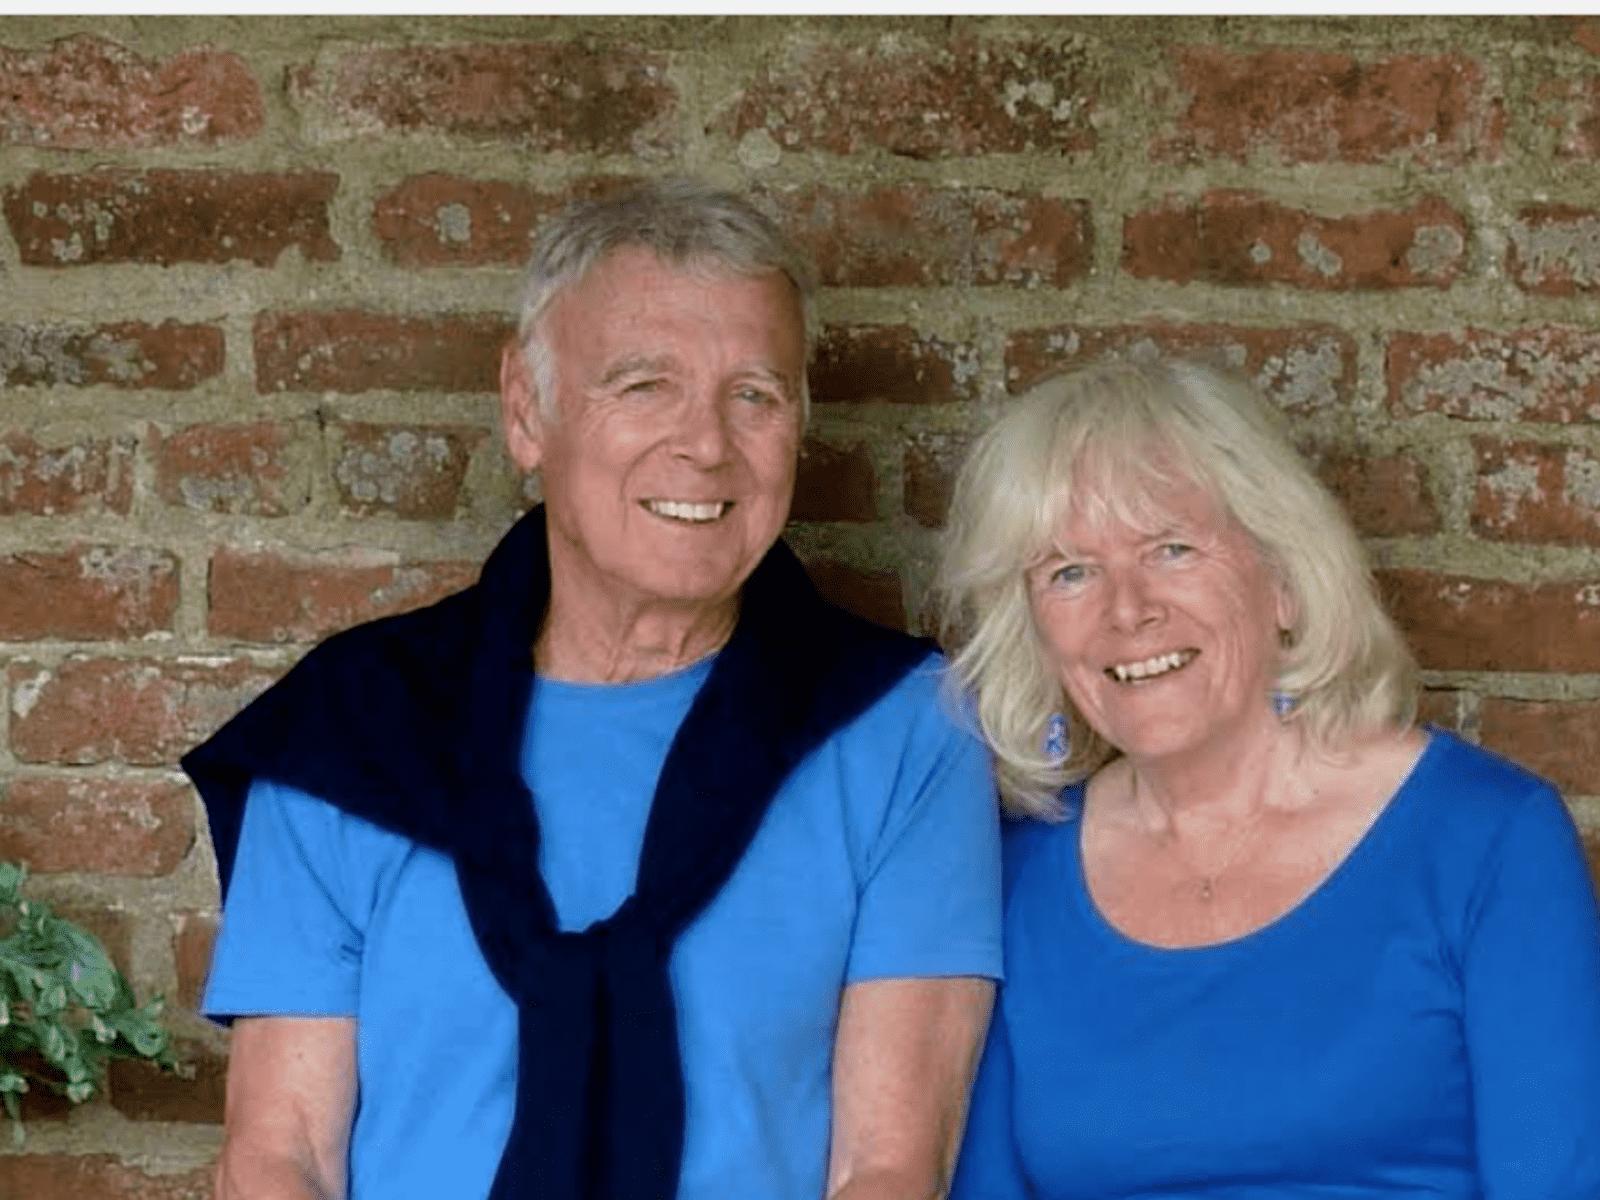 Jane & Richard from Bordeaux, Guernsey